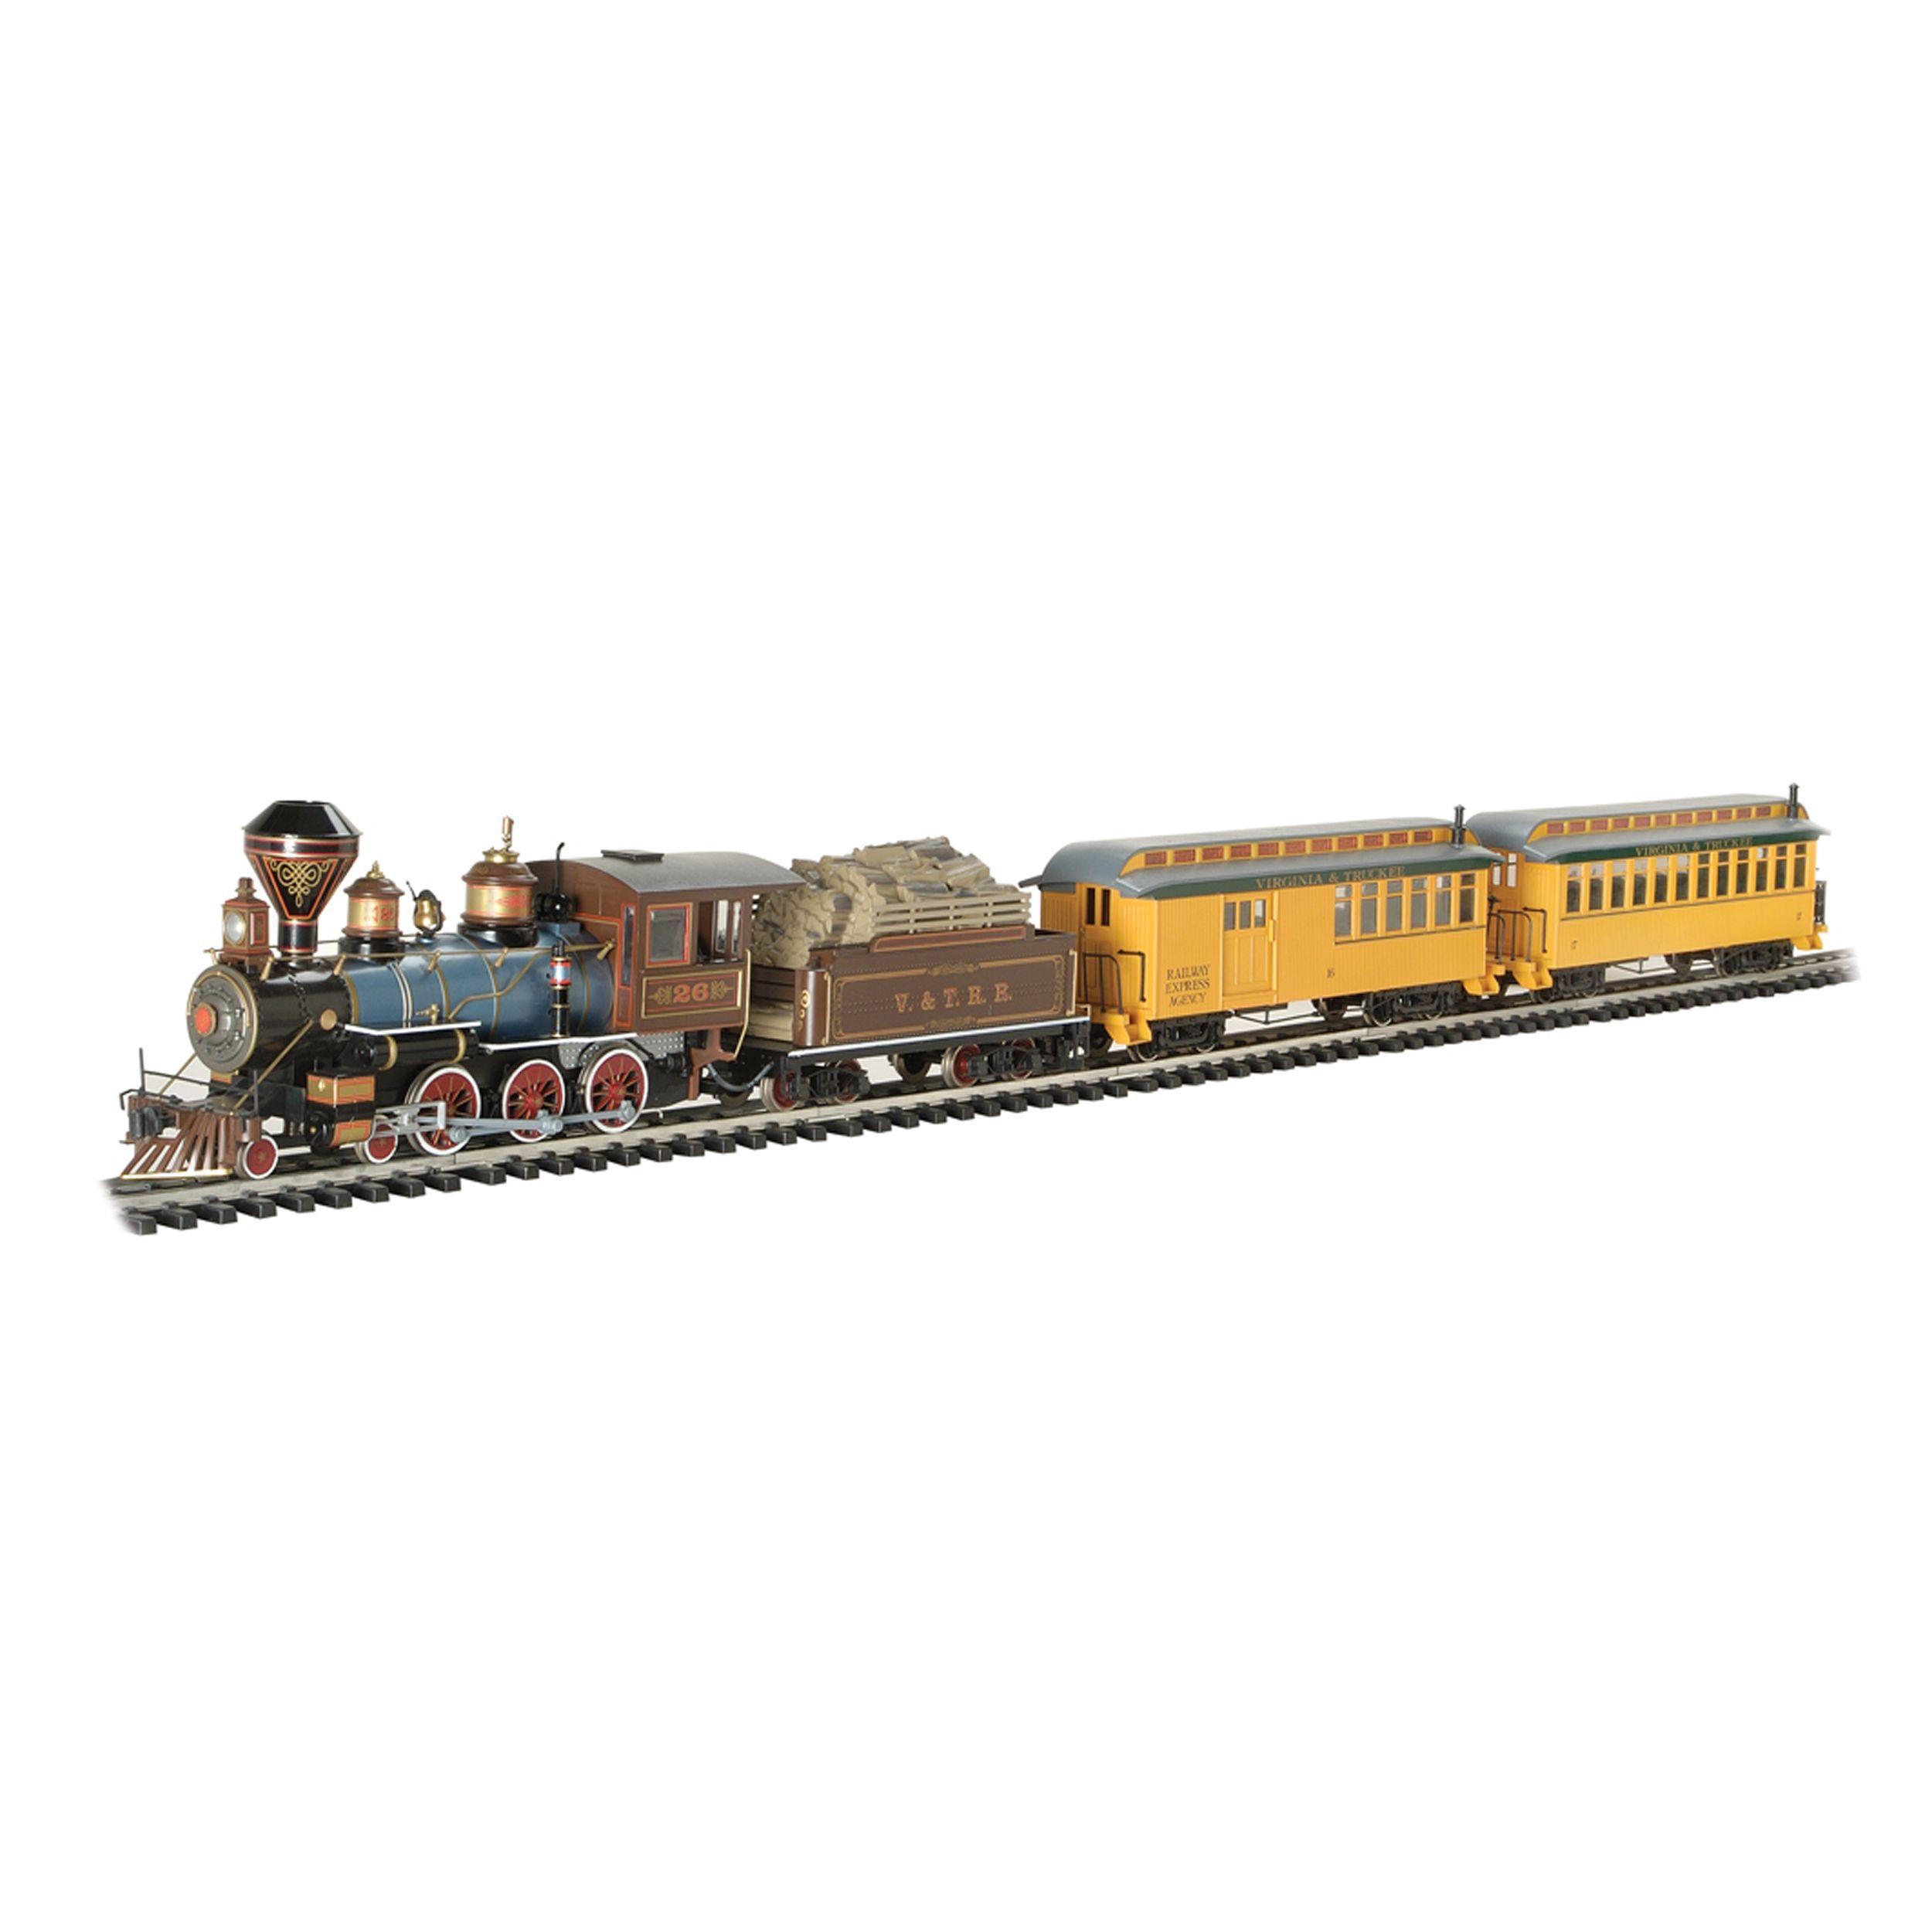 Bachmann Trains Silverado Virginia and Truckee Large G Scale Ready ...